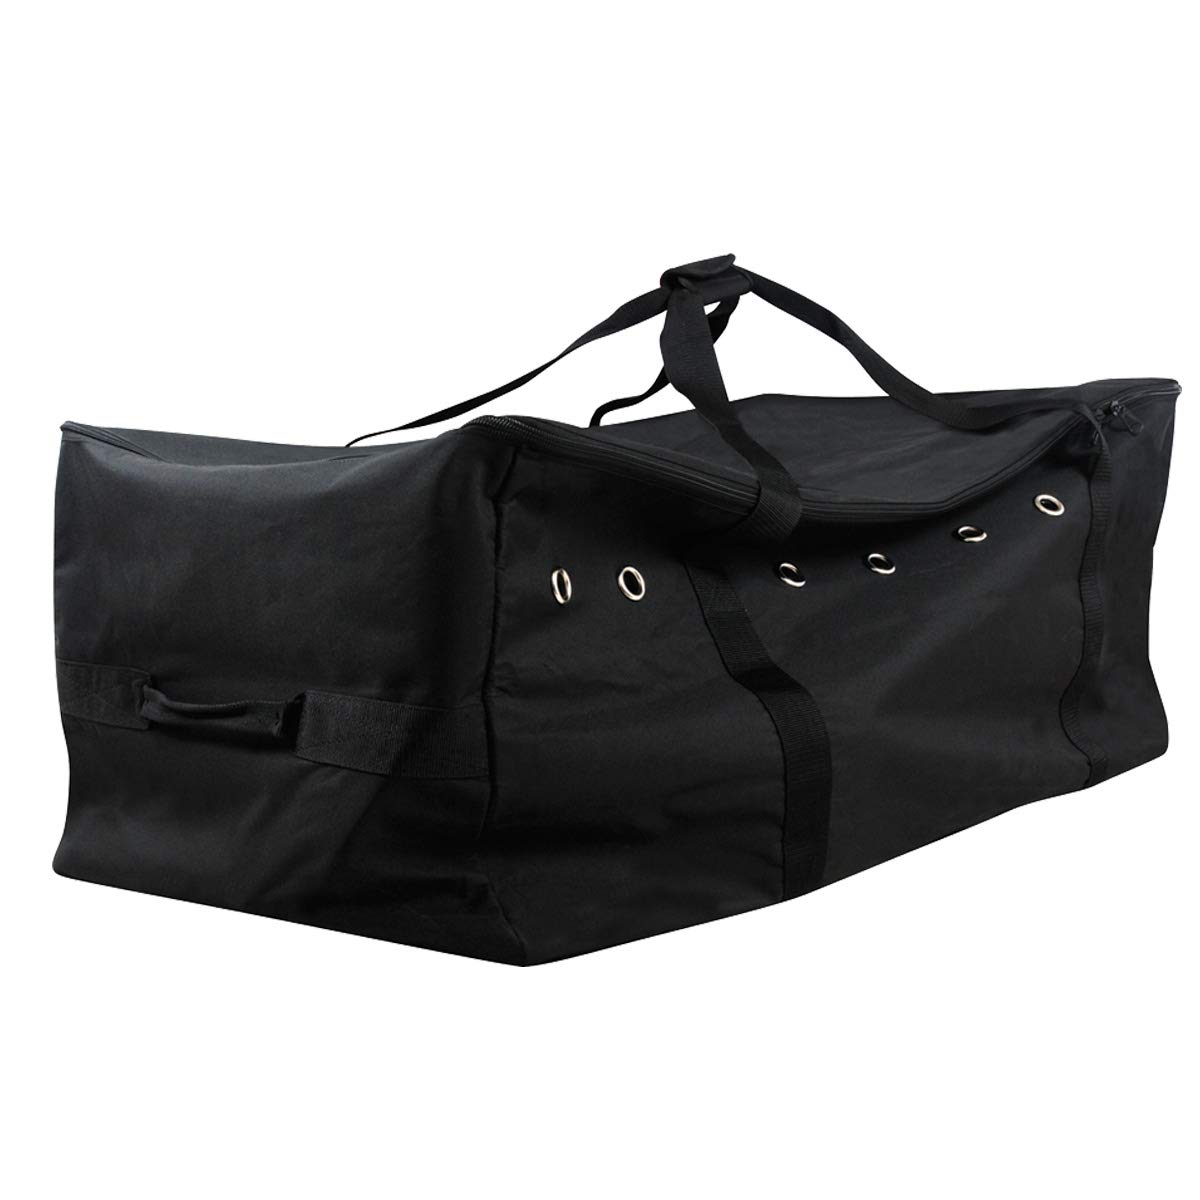 Cashel Hay Bale Bag, Full by Cashel